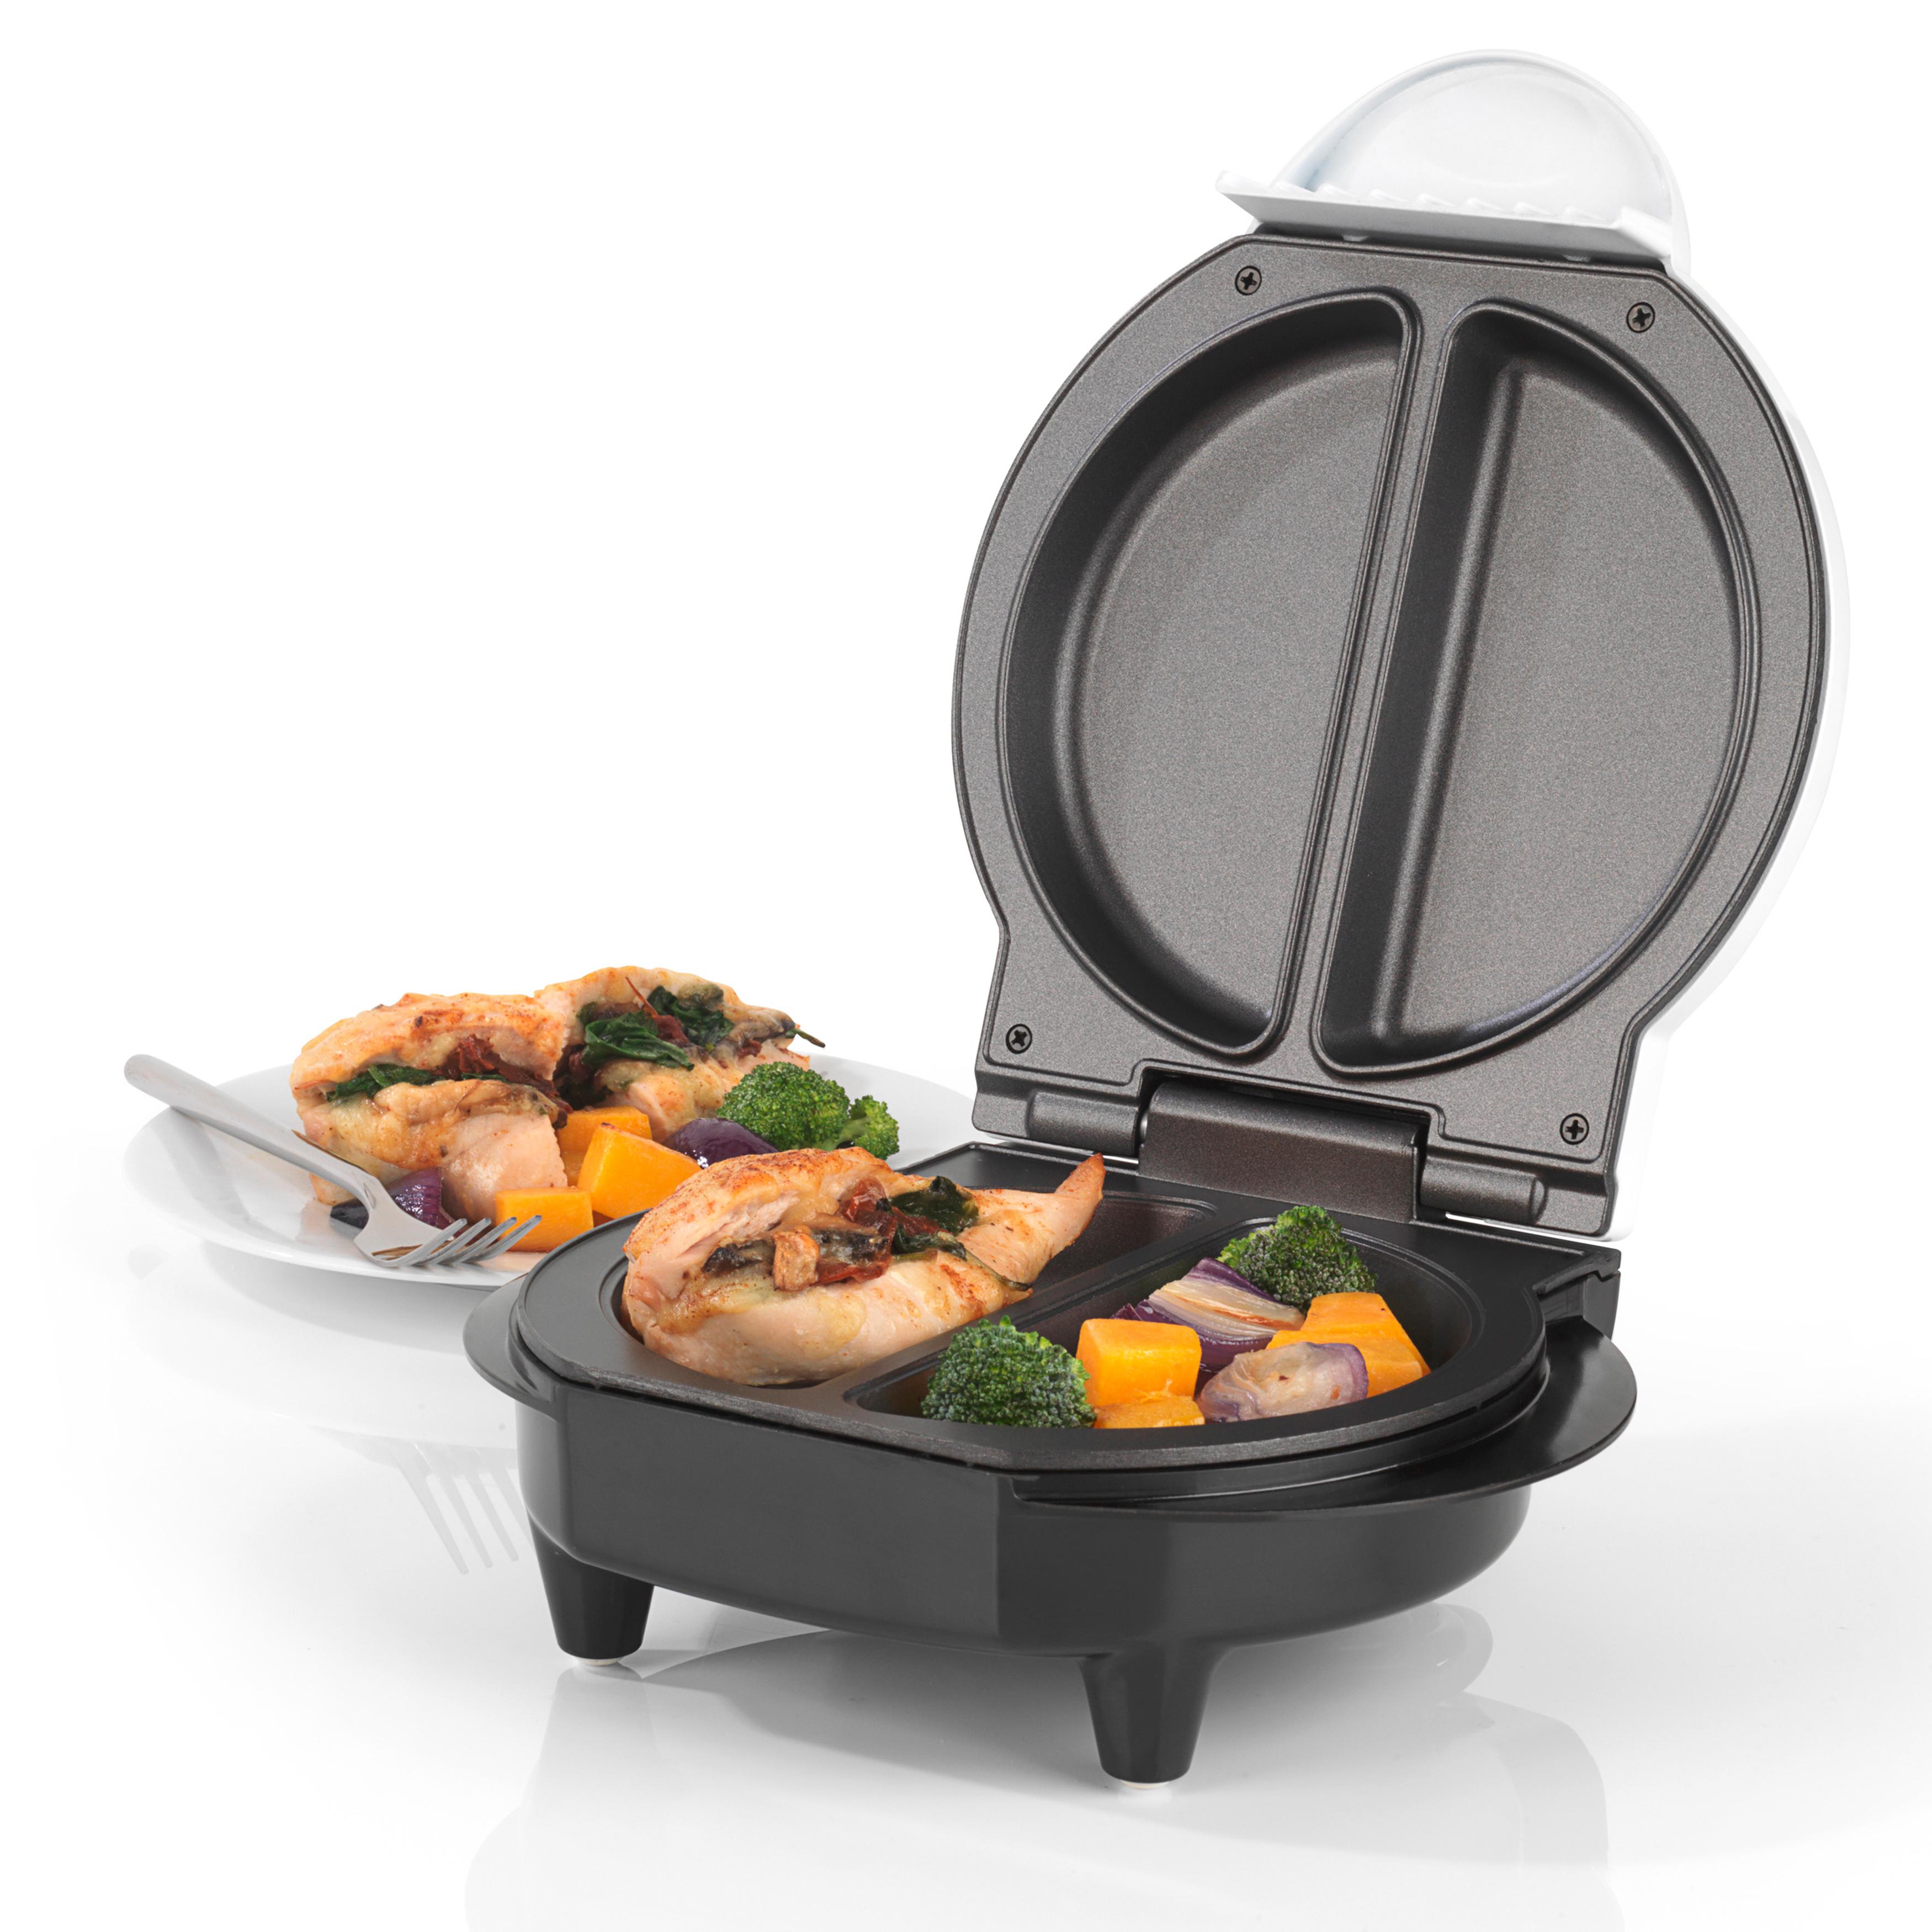 Salter Ek2305 Multi Menu Grill Appliances No1brands4you